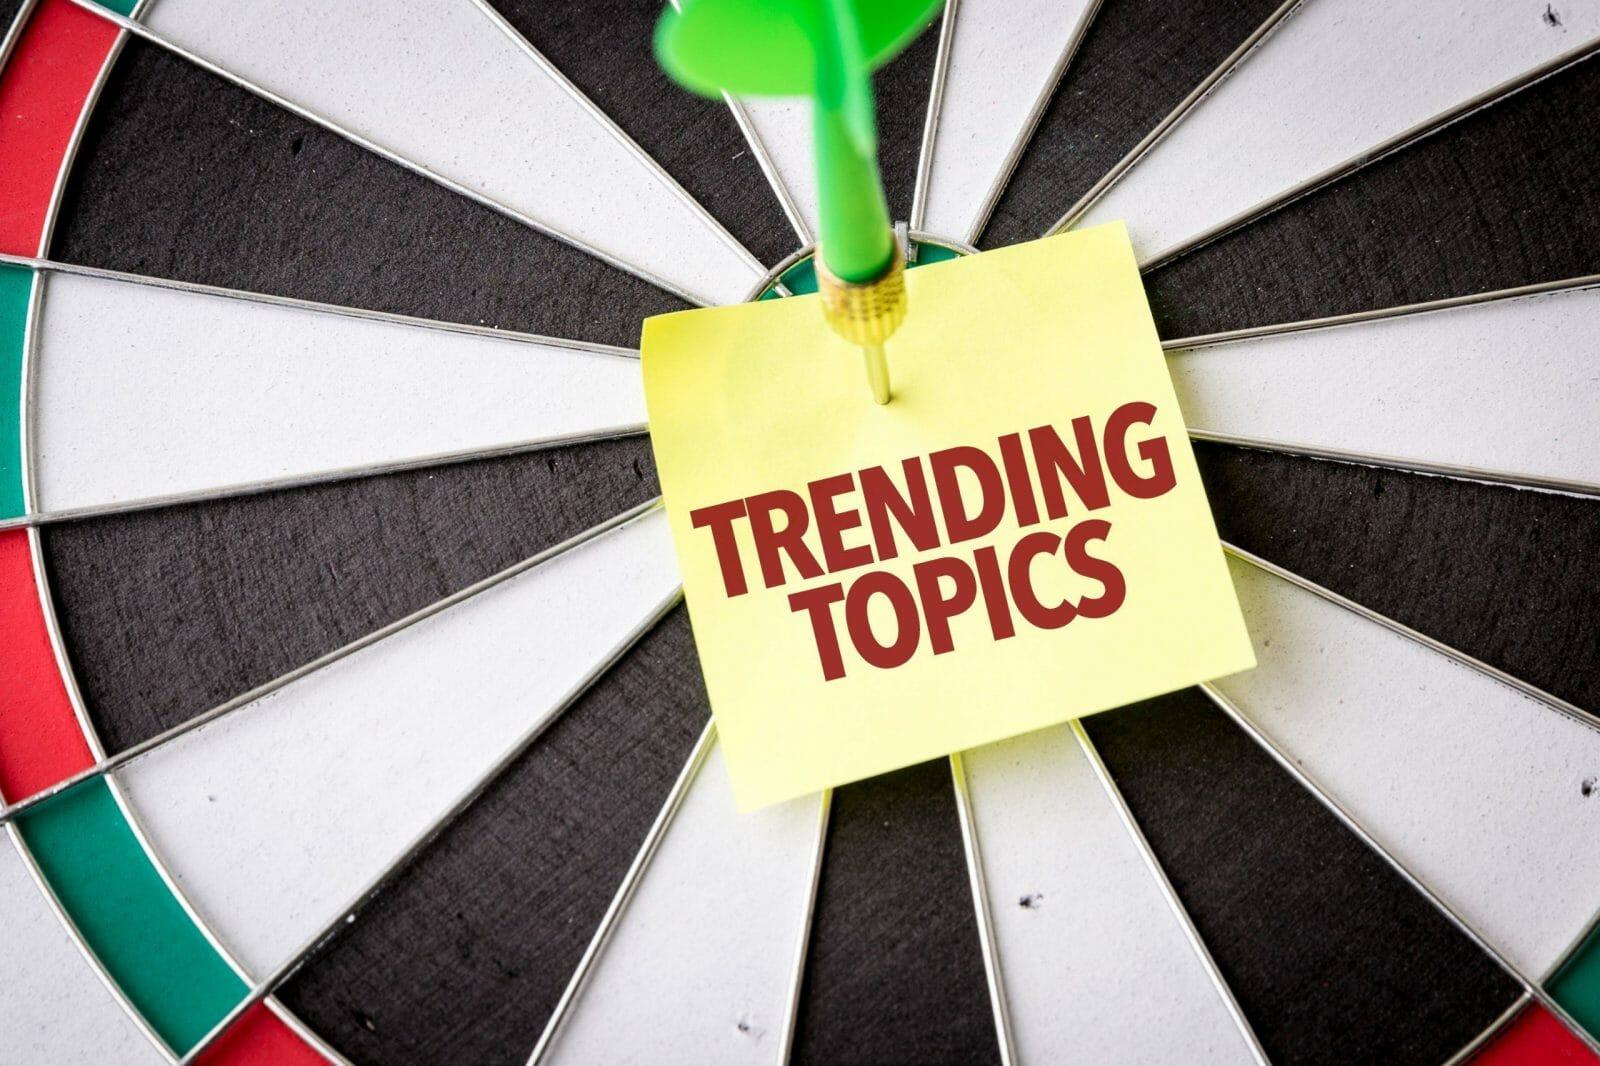 Trending Topics sign